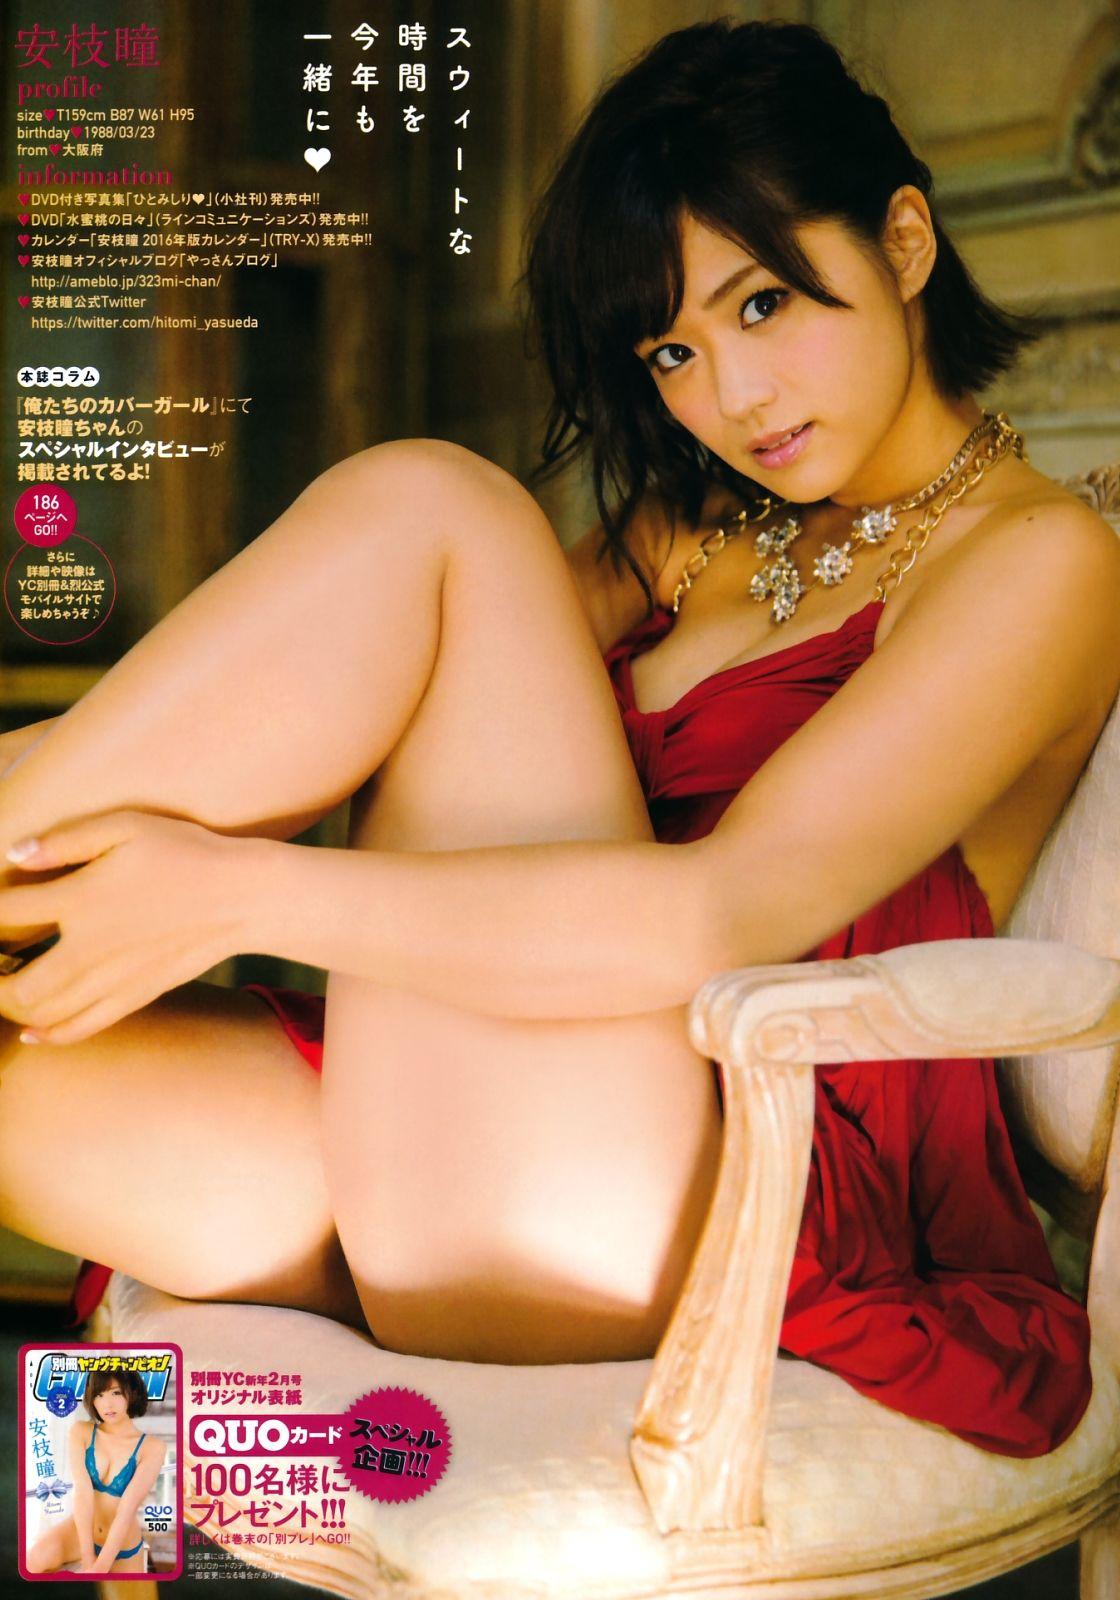 [Young Champion杂志写真]安枝瞳超高清写真大图片(25P)|690热度